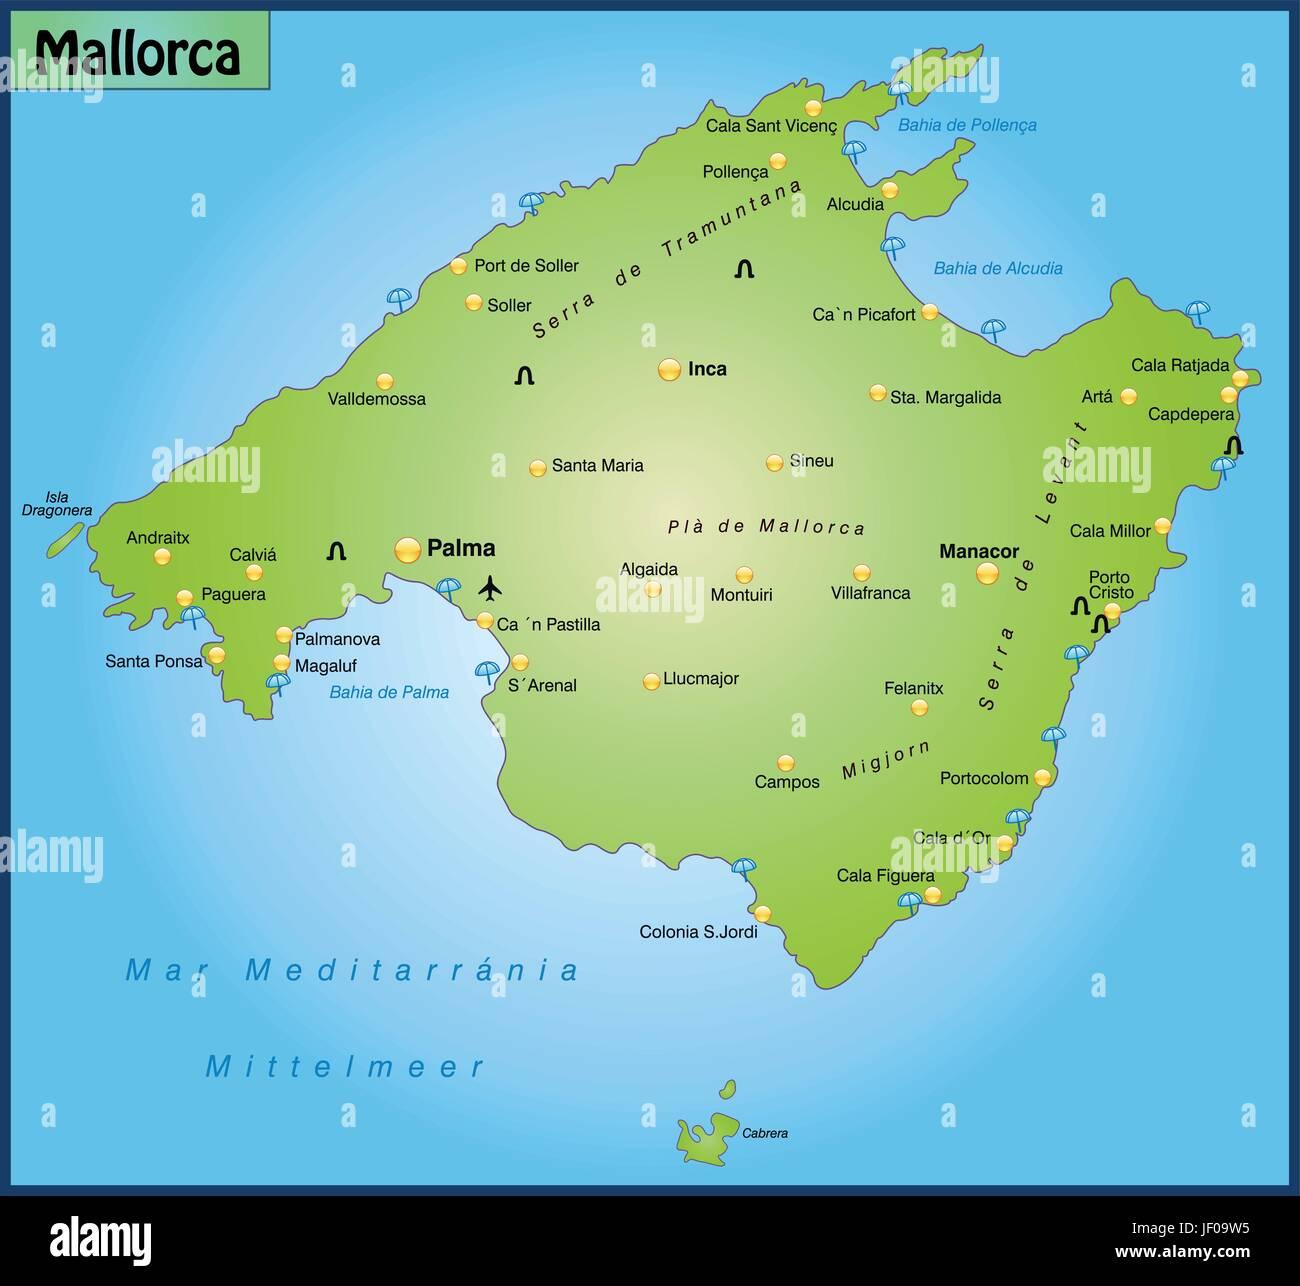 card, atlas, map of the world, map, mallorca, border, card, synopsis ...